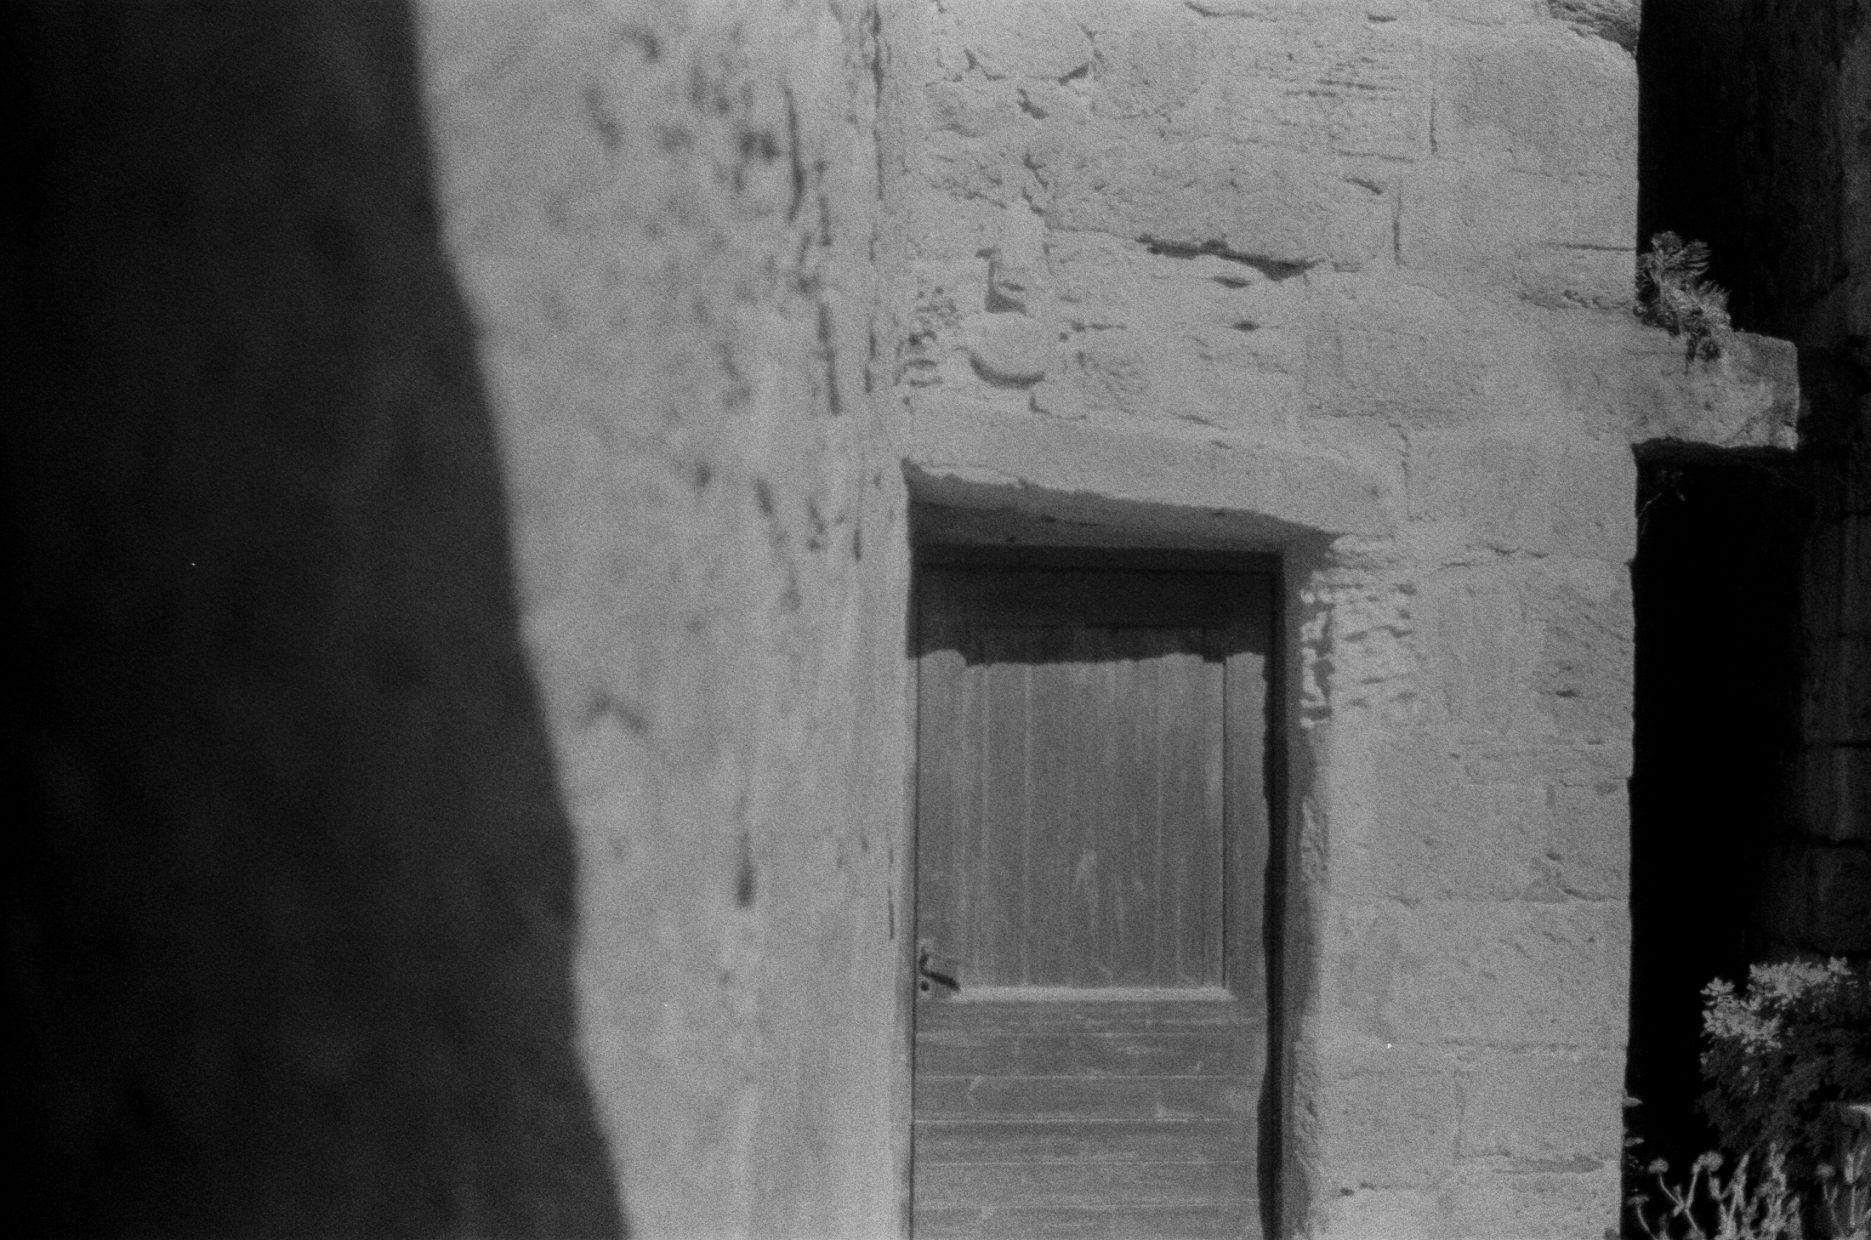 la roque gageac black and white street film kodak photography art fine art dordogne region perigueux teri b photo canon ae-1 program 35mm film analogue